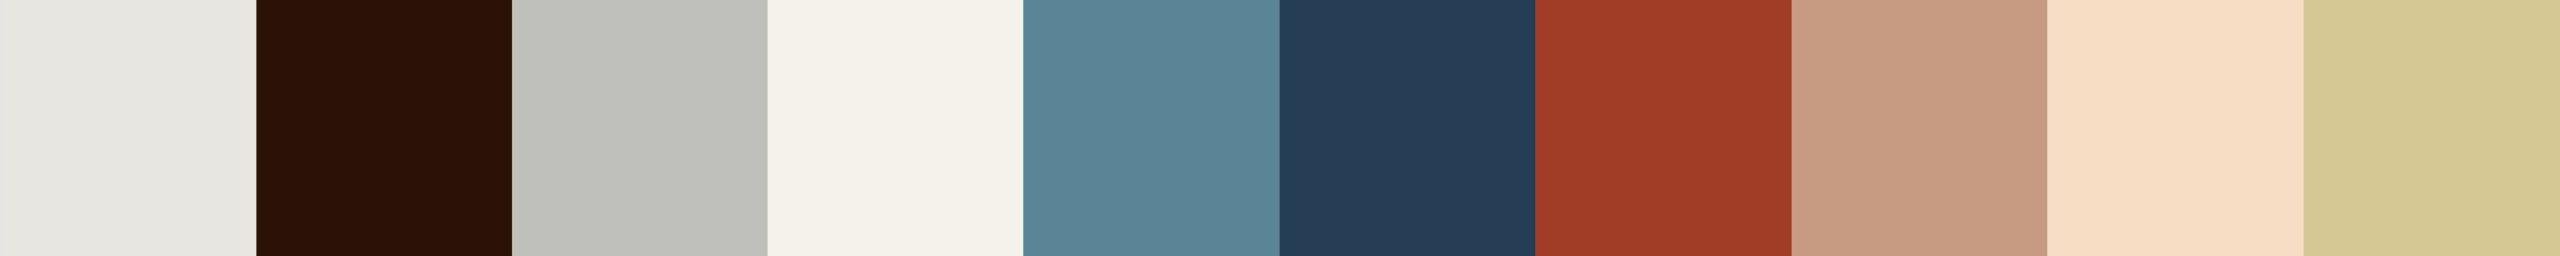 651 Ryava Color Palette